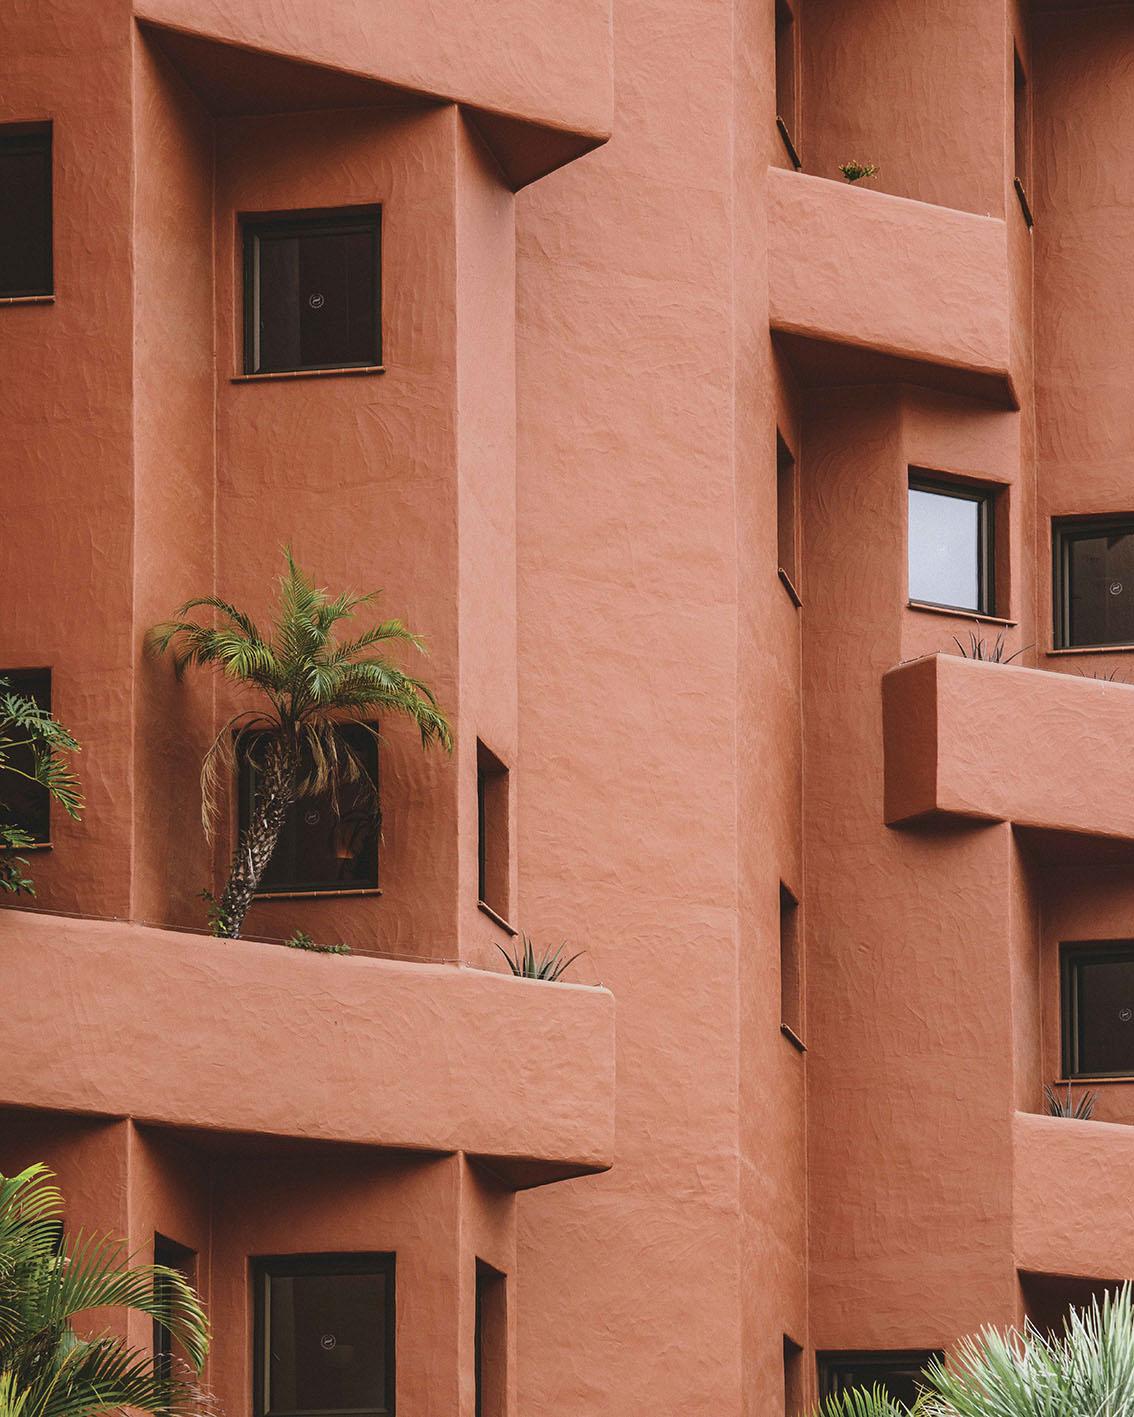 yosigo_arquitectura0 (1).jpg